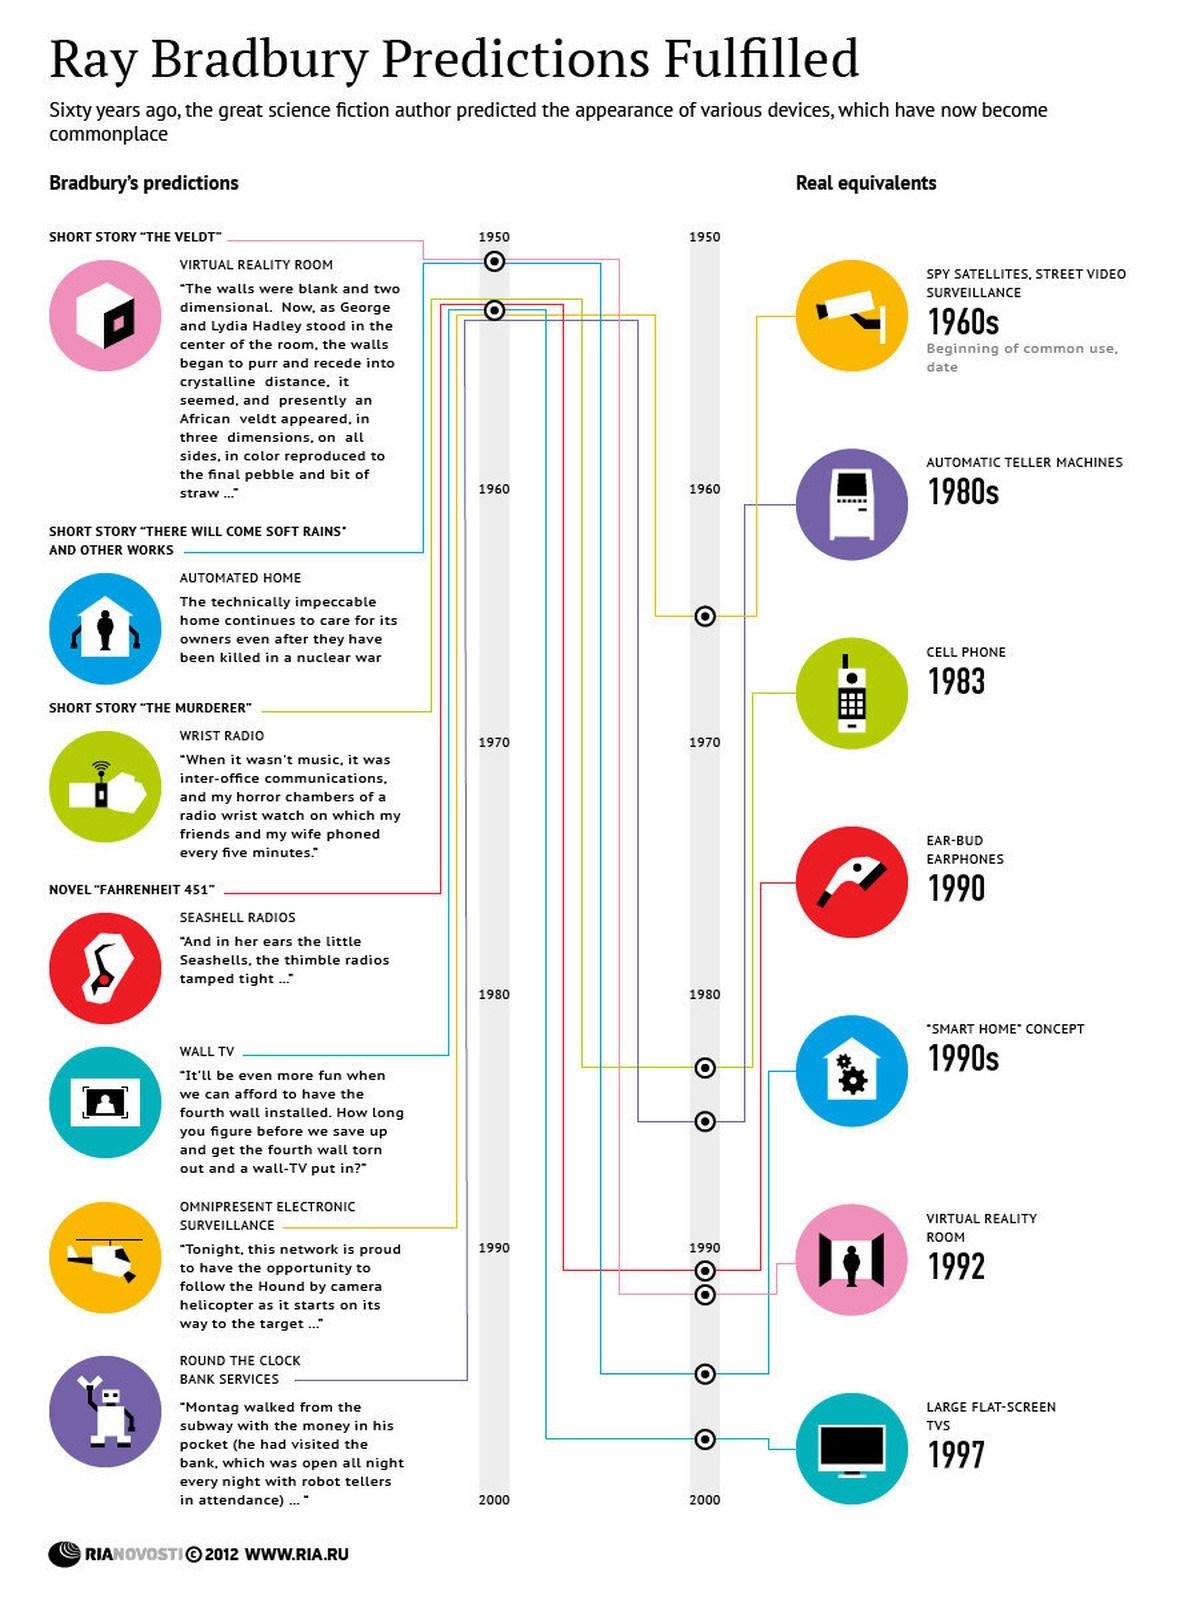 00-ria-novosti-infographics-ray-bradburys-prophecies-fulfilled-2012.jpeg